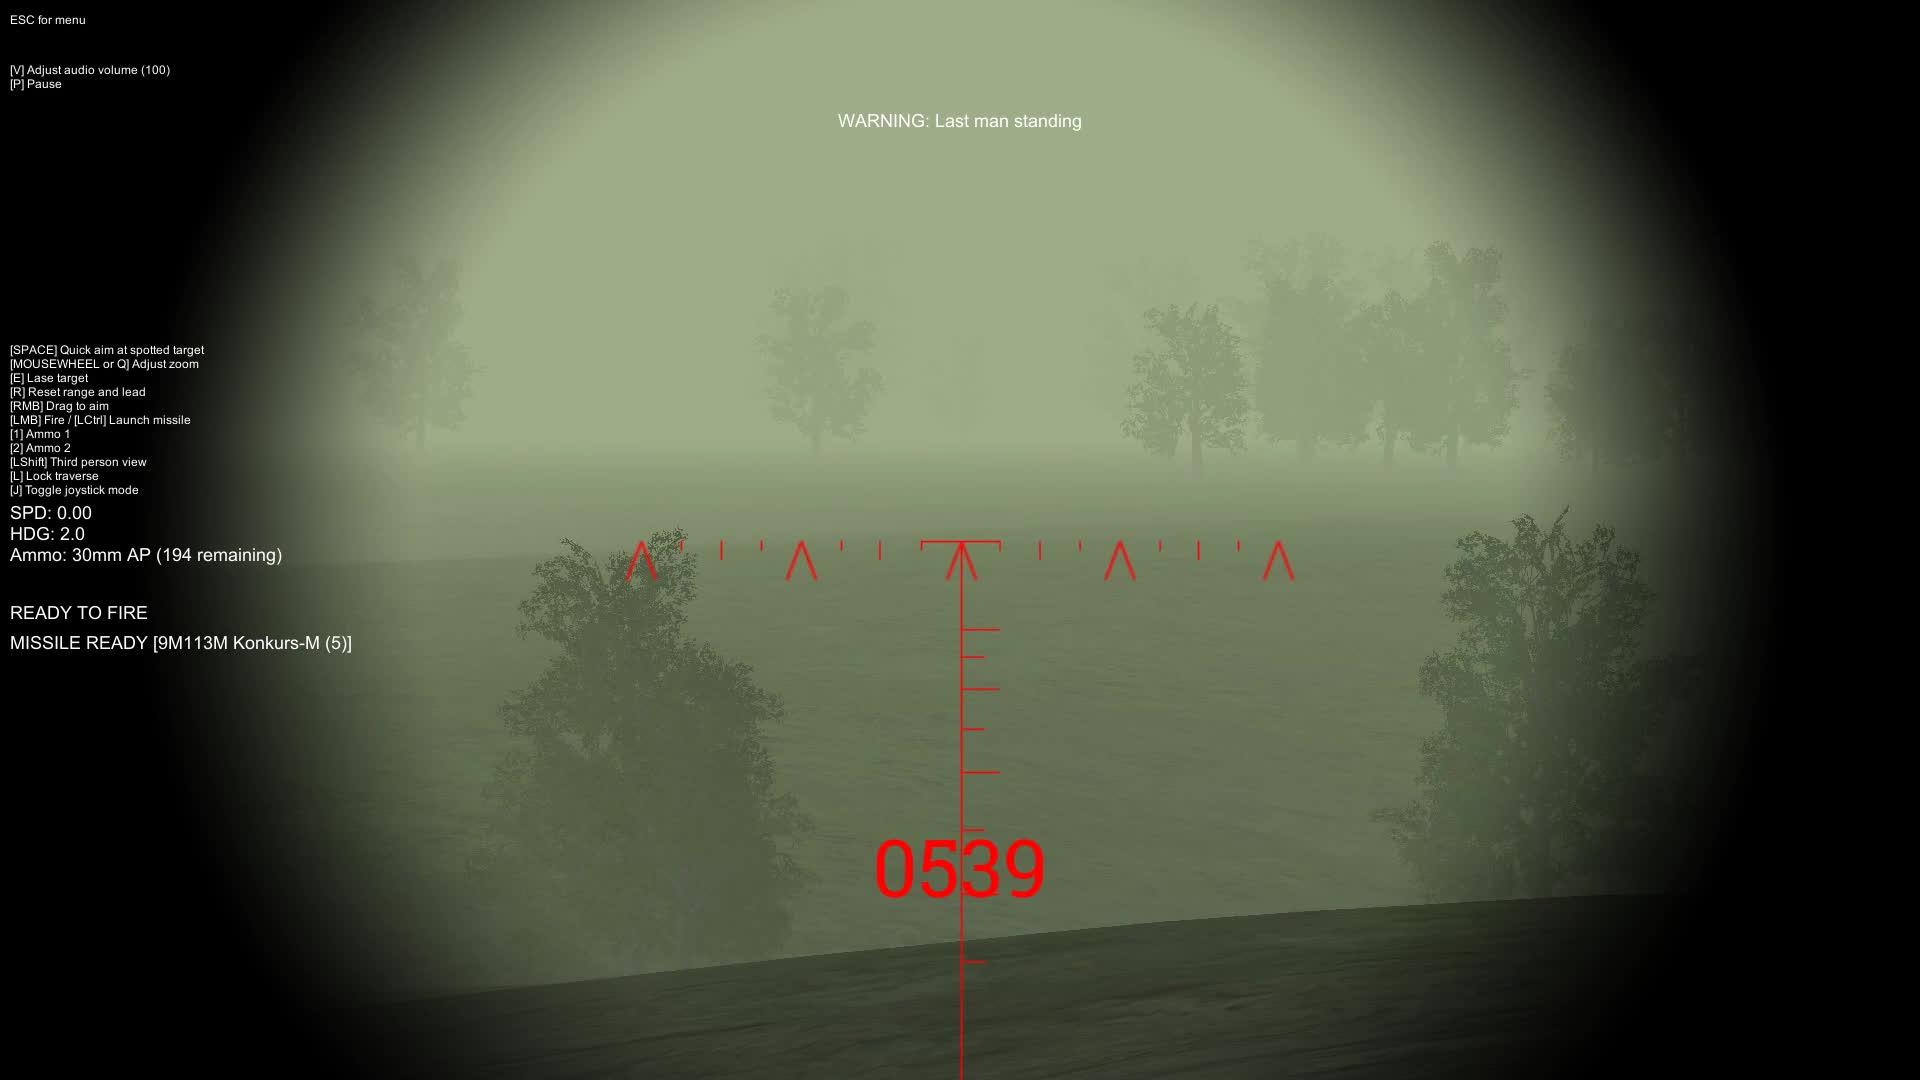 tanks, unity, unity3d, Konkurs-M ATGM kill (Unity3D | ActionScripter9109) GIFs